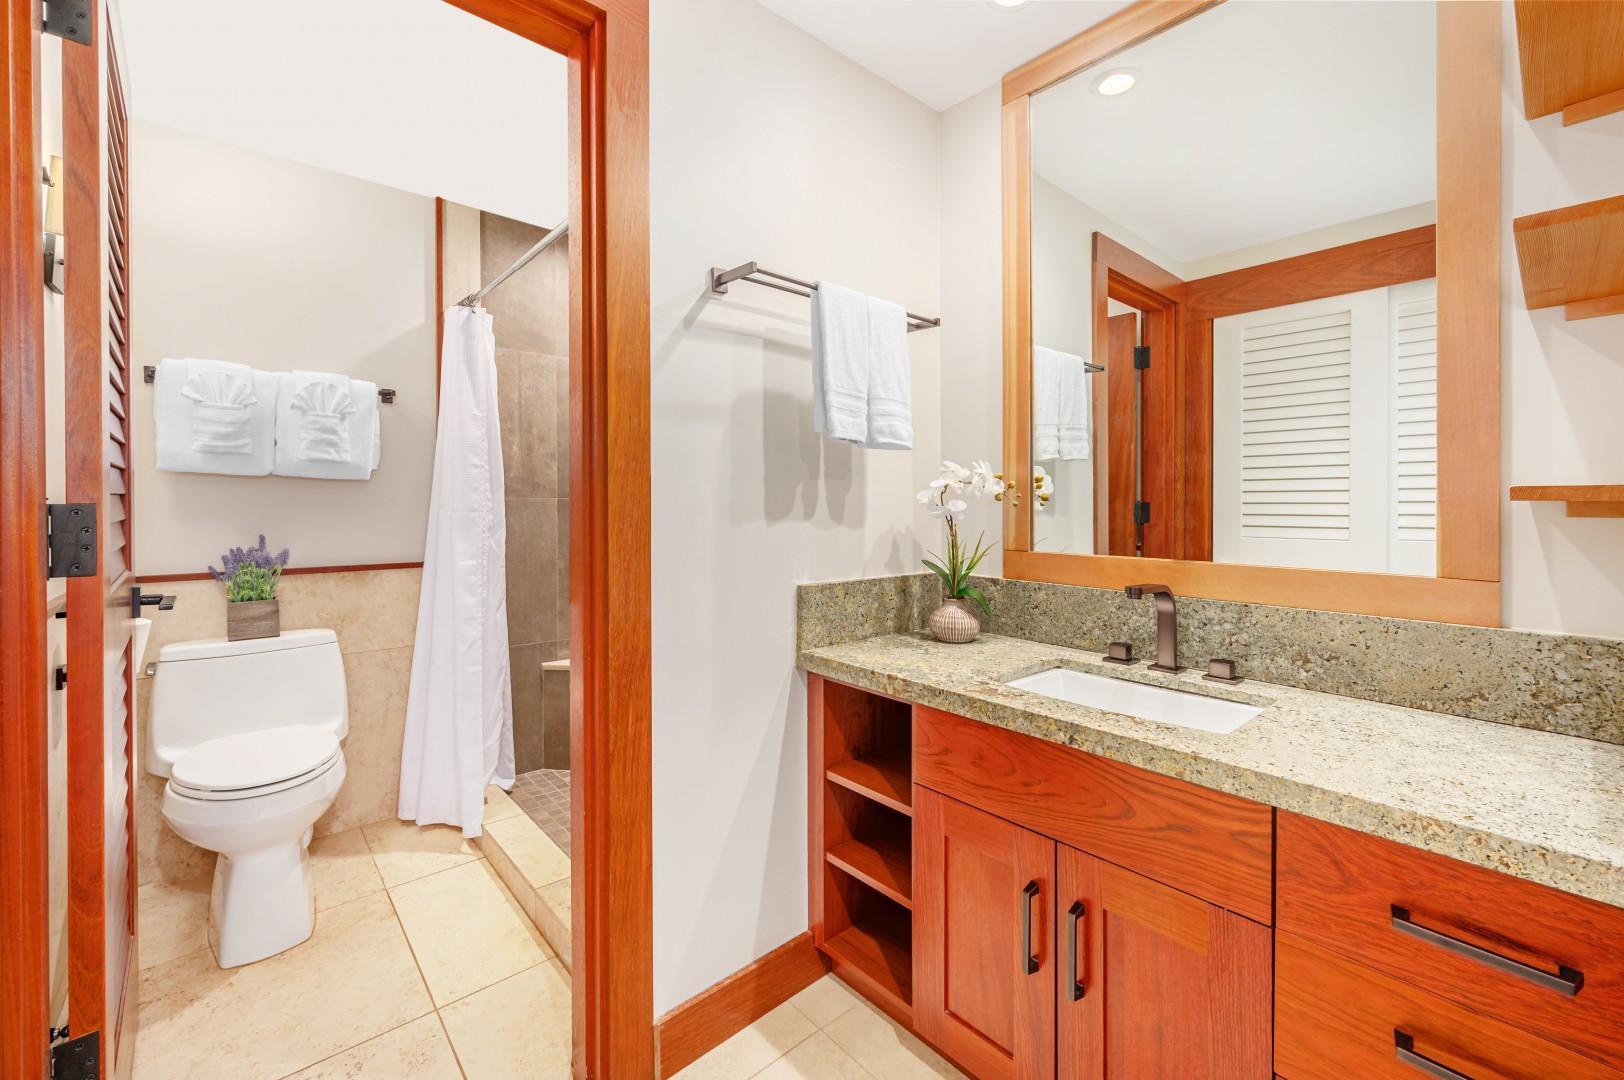 Ensuite Bathroom off of the master bedroom